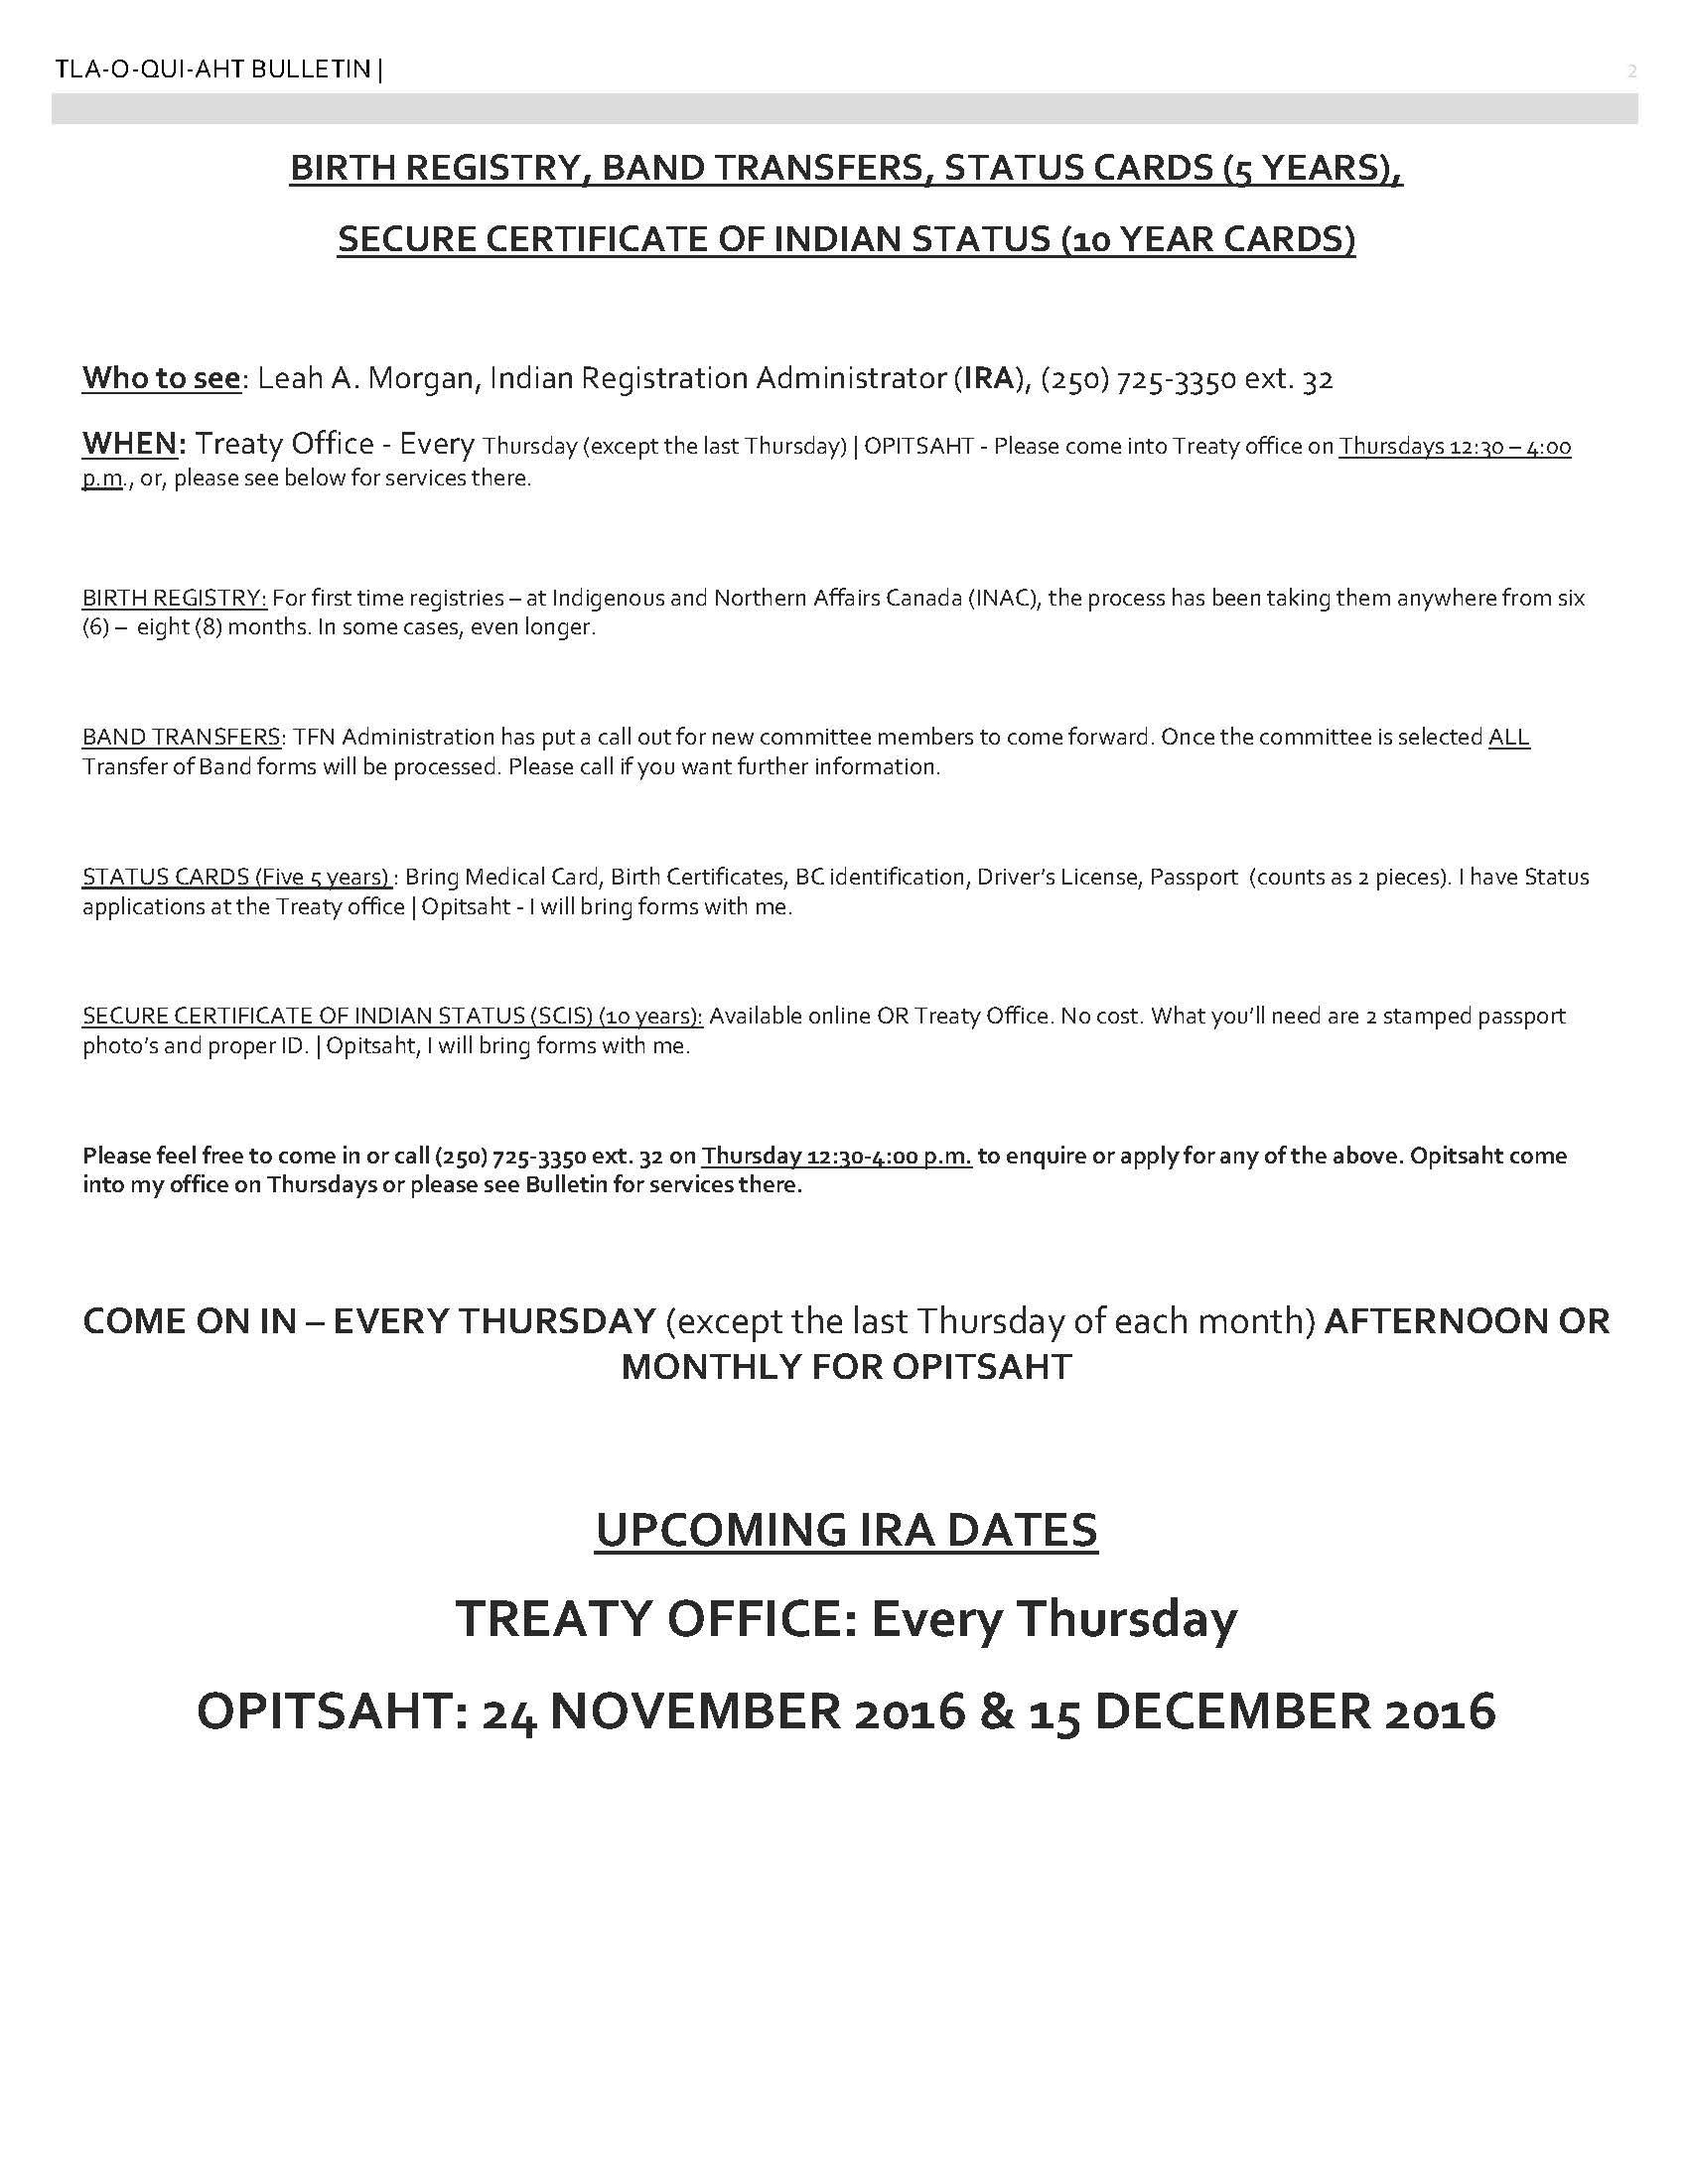 0TFN Bulletin Nov 15-2016_Page_02.jpg